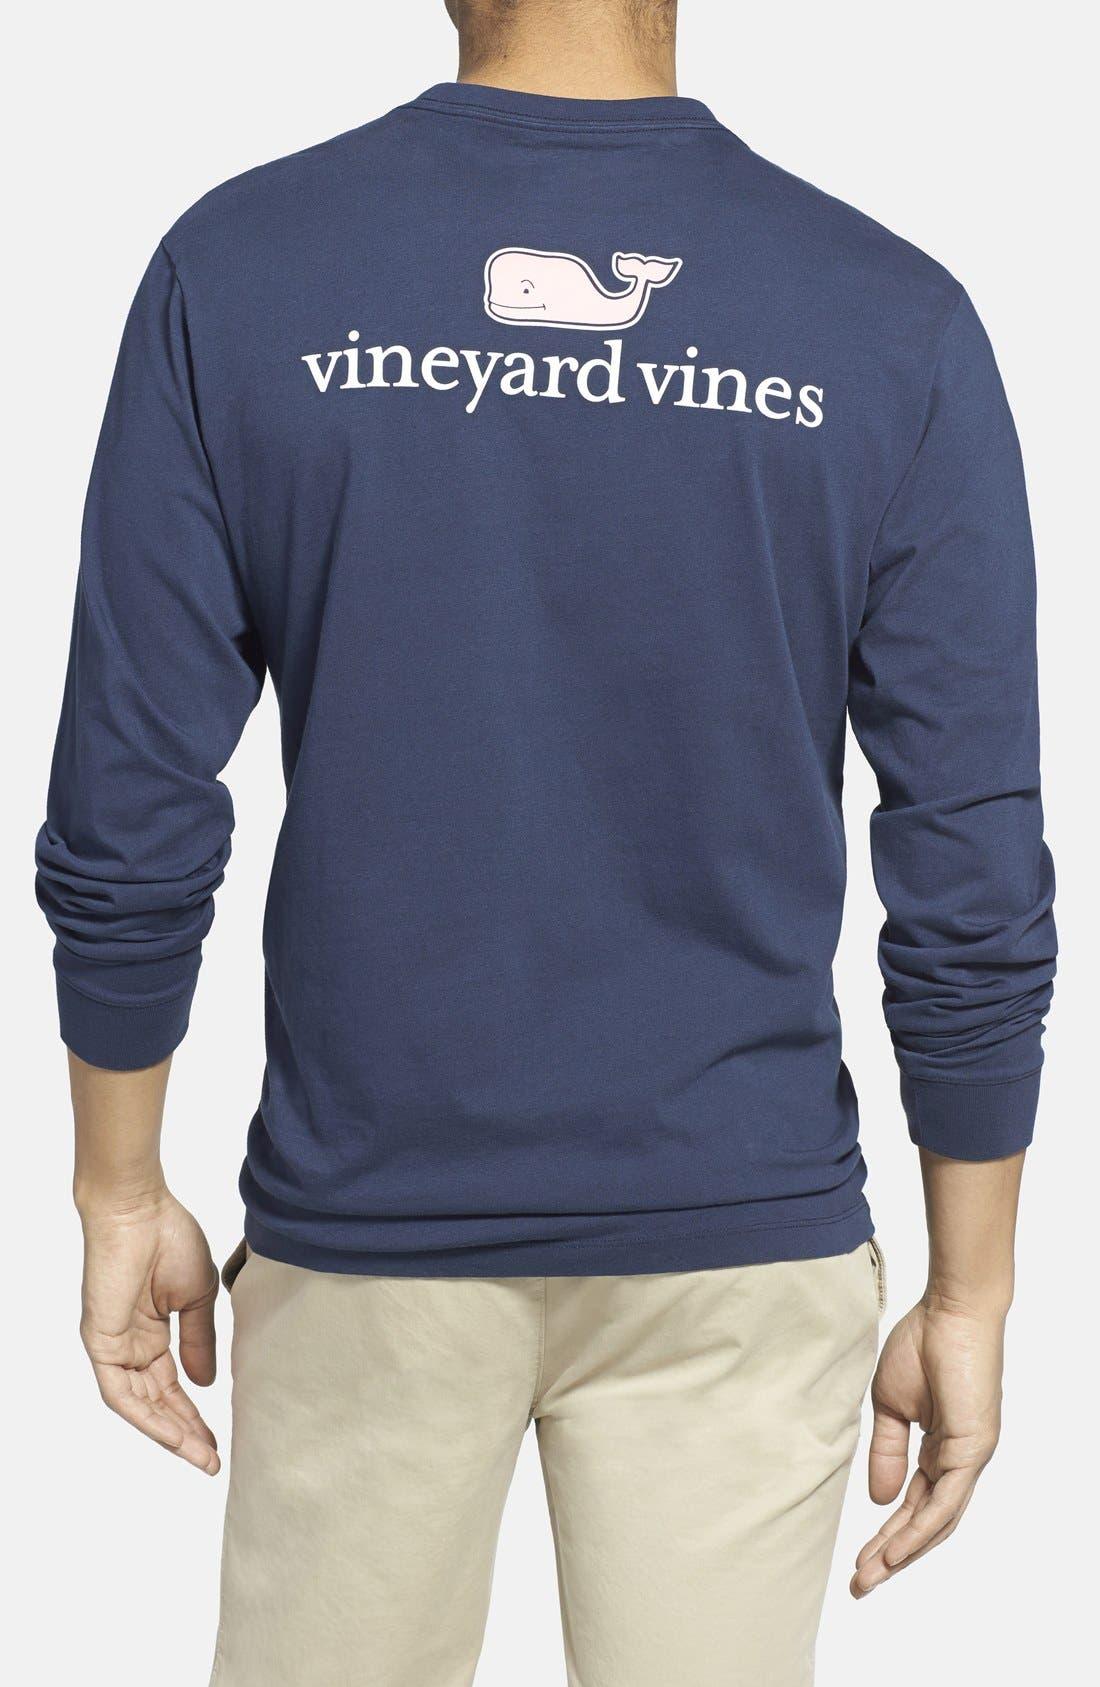 Alternate Image 1 Selected - vineyard vines Logo Pocket Long Sleeve Crewneck T-Shirt